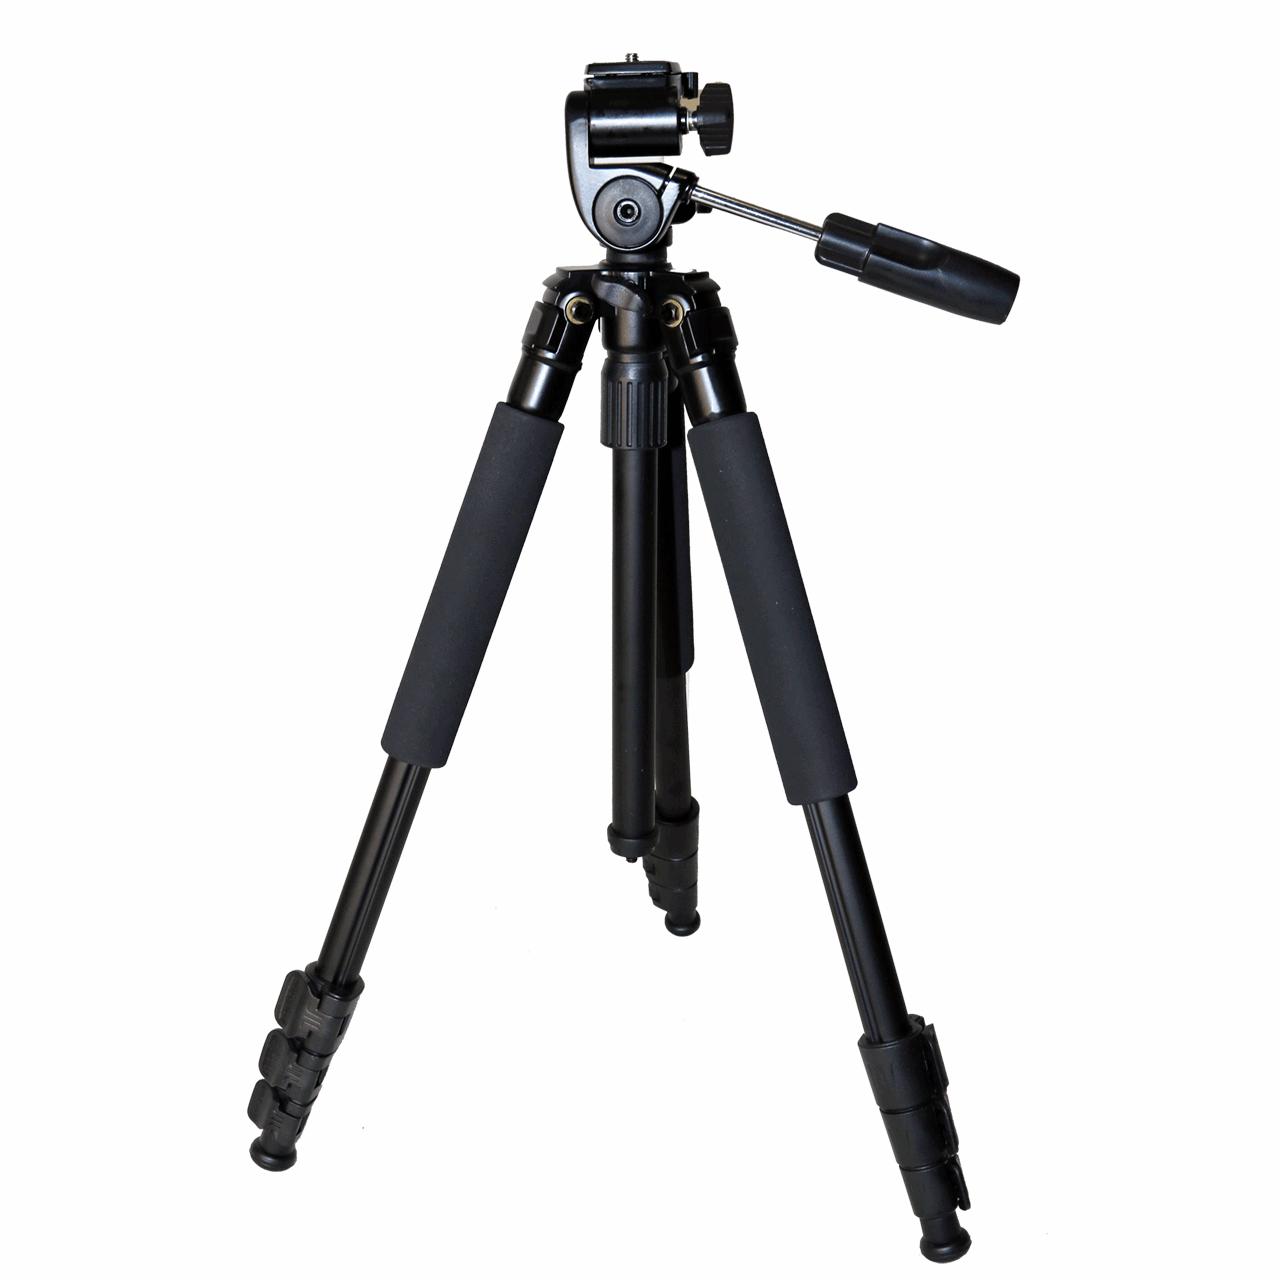 سه پایه دوربین ویفنگ مدل WT-3642